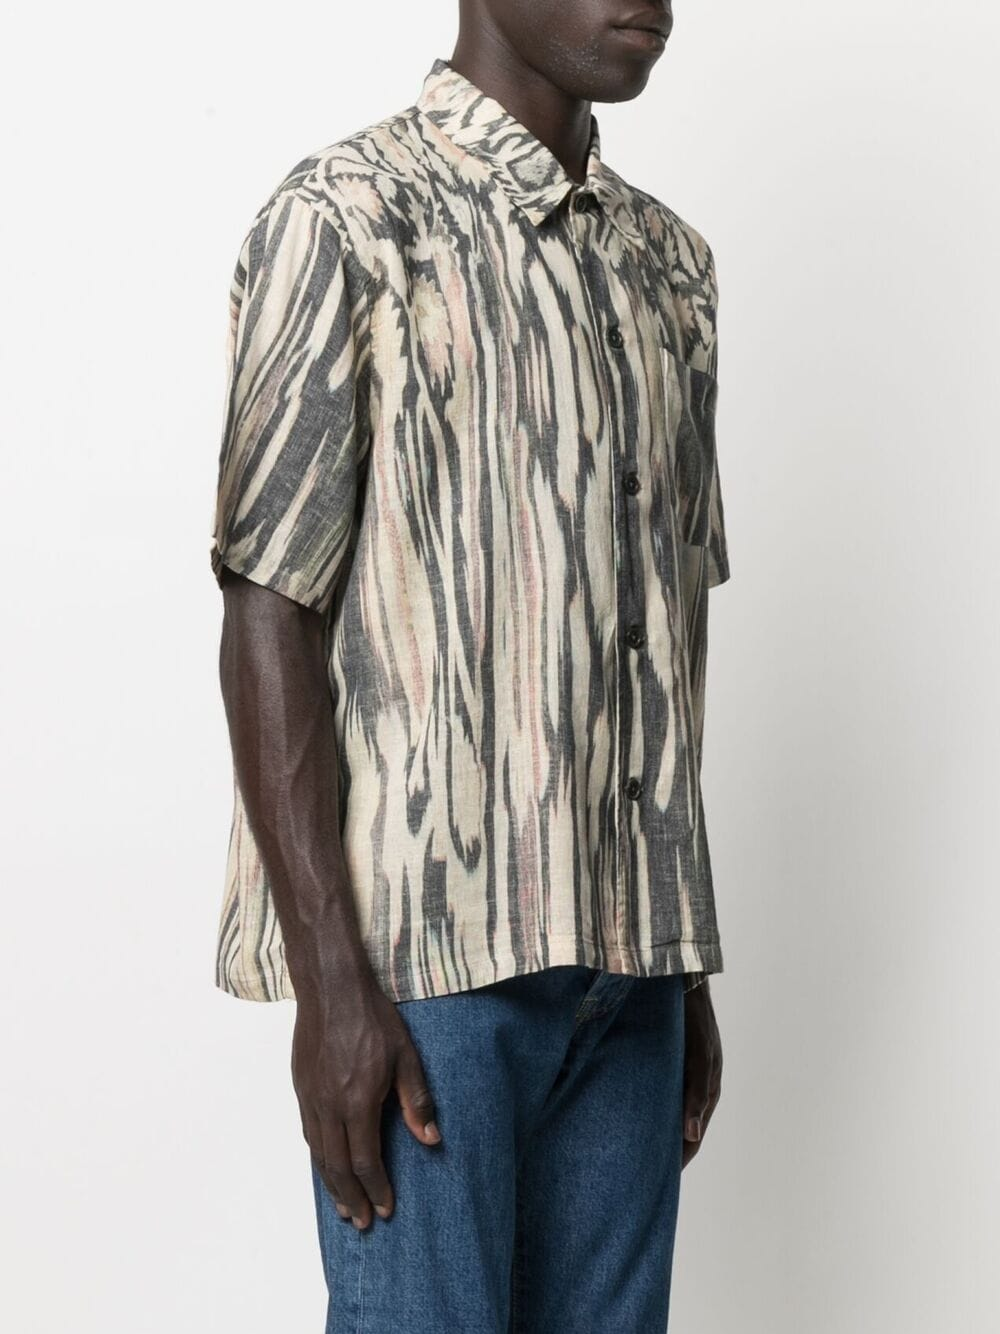 Our Legacy camicia con stampa astratta uomo multicolore OUR LEGACY | Camicie | M2212BSHPHANABI